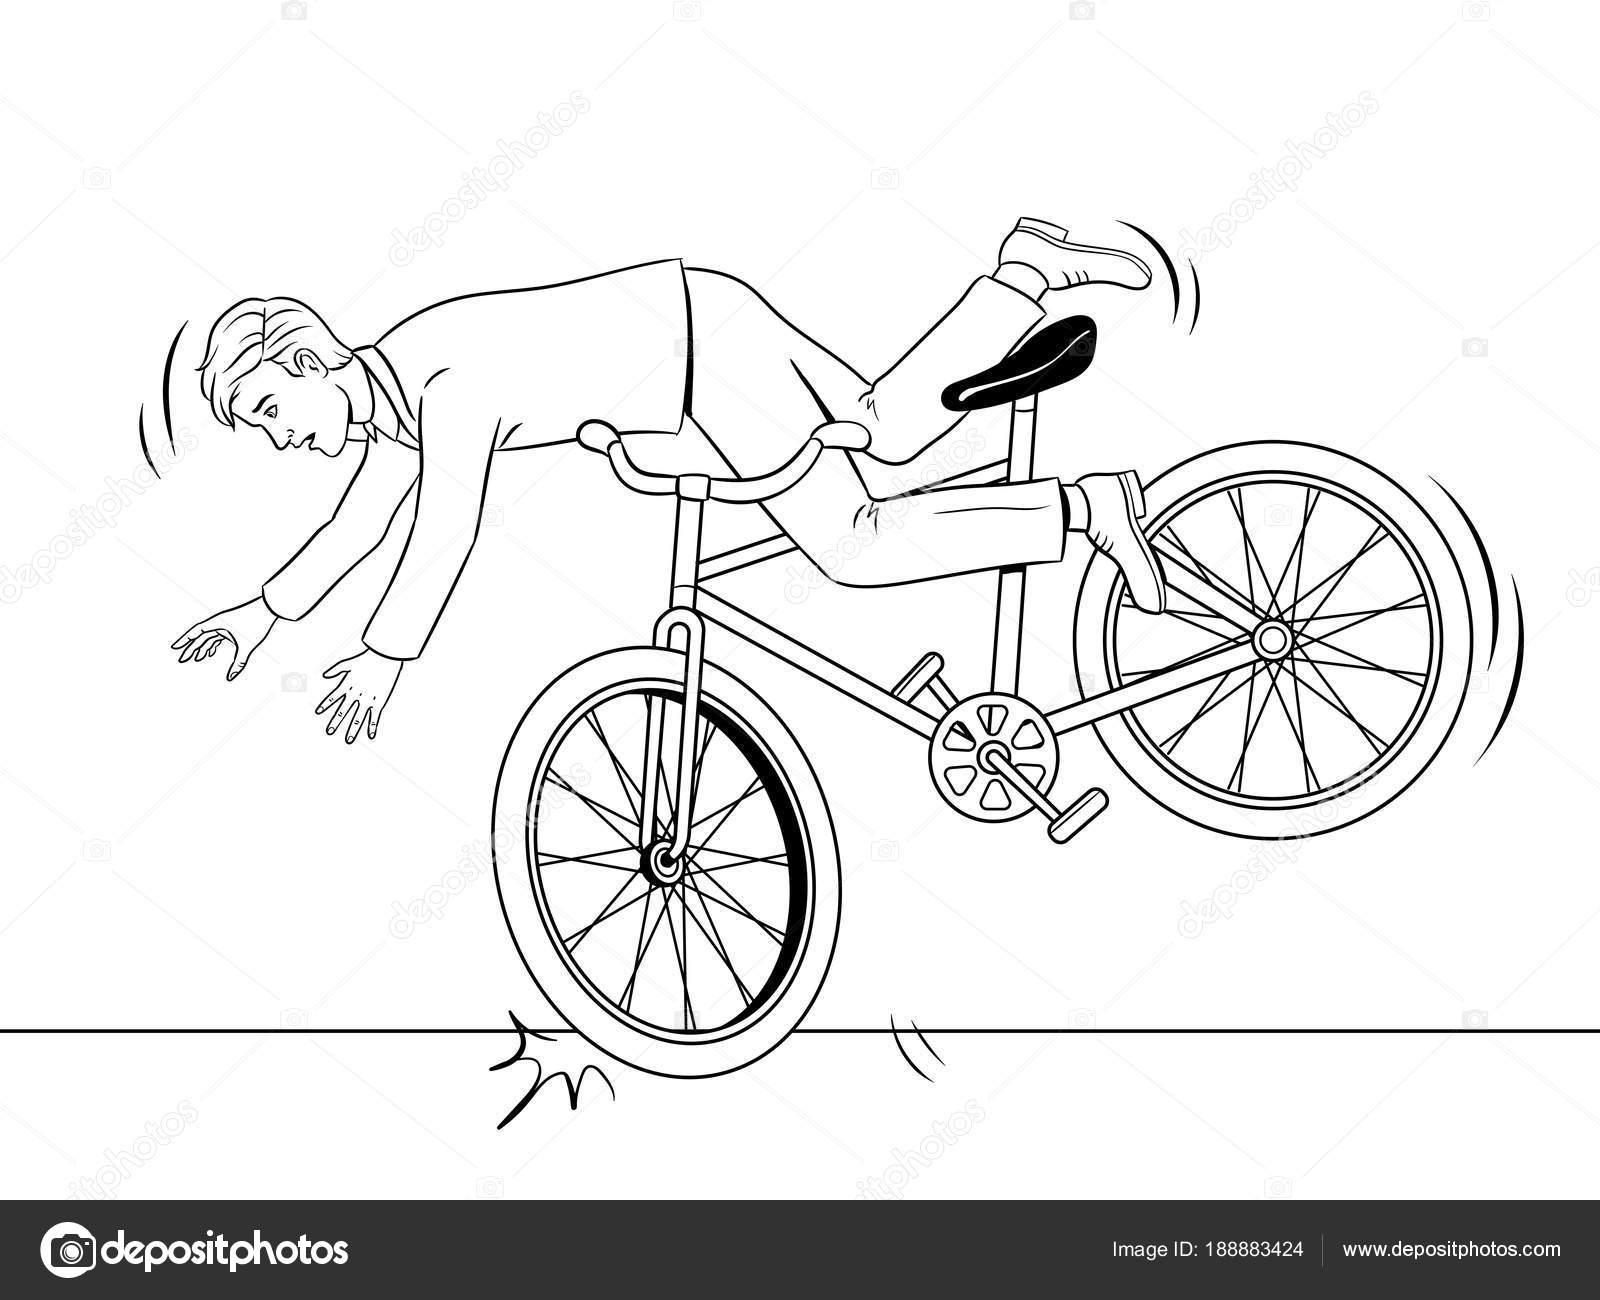 Dibujos Bicicletas Para Colorear Hombre Cae De Bicicleta Para